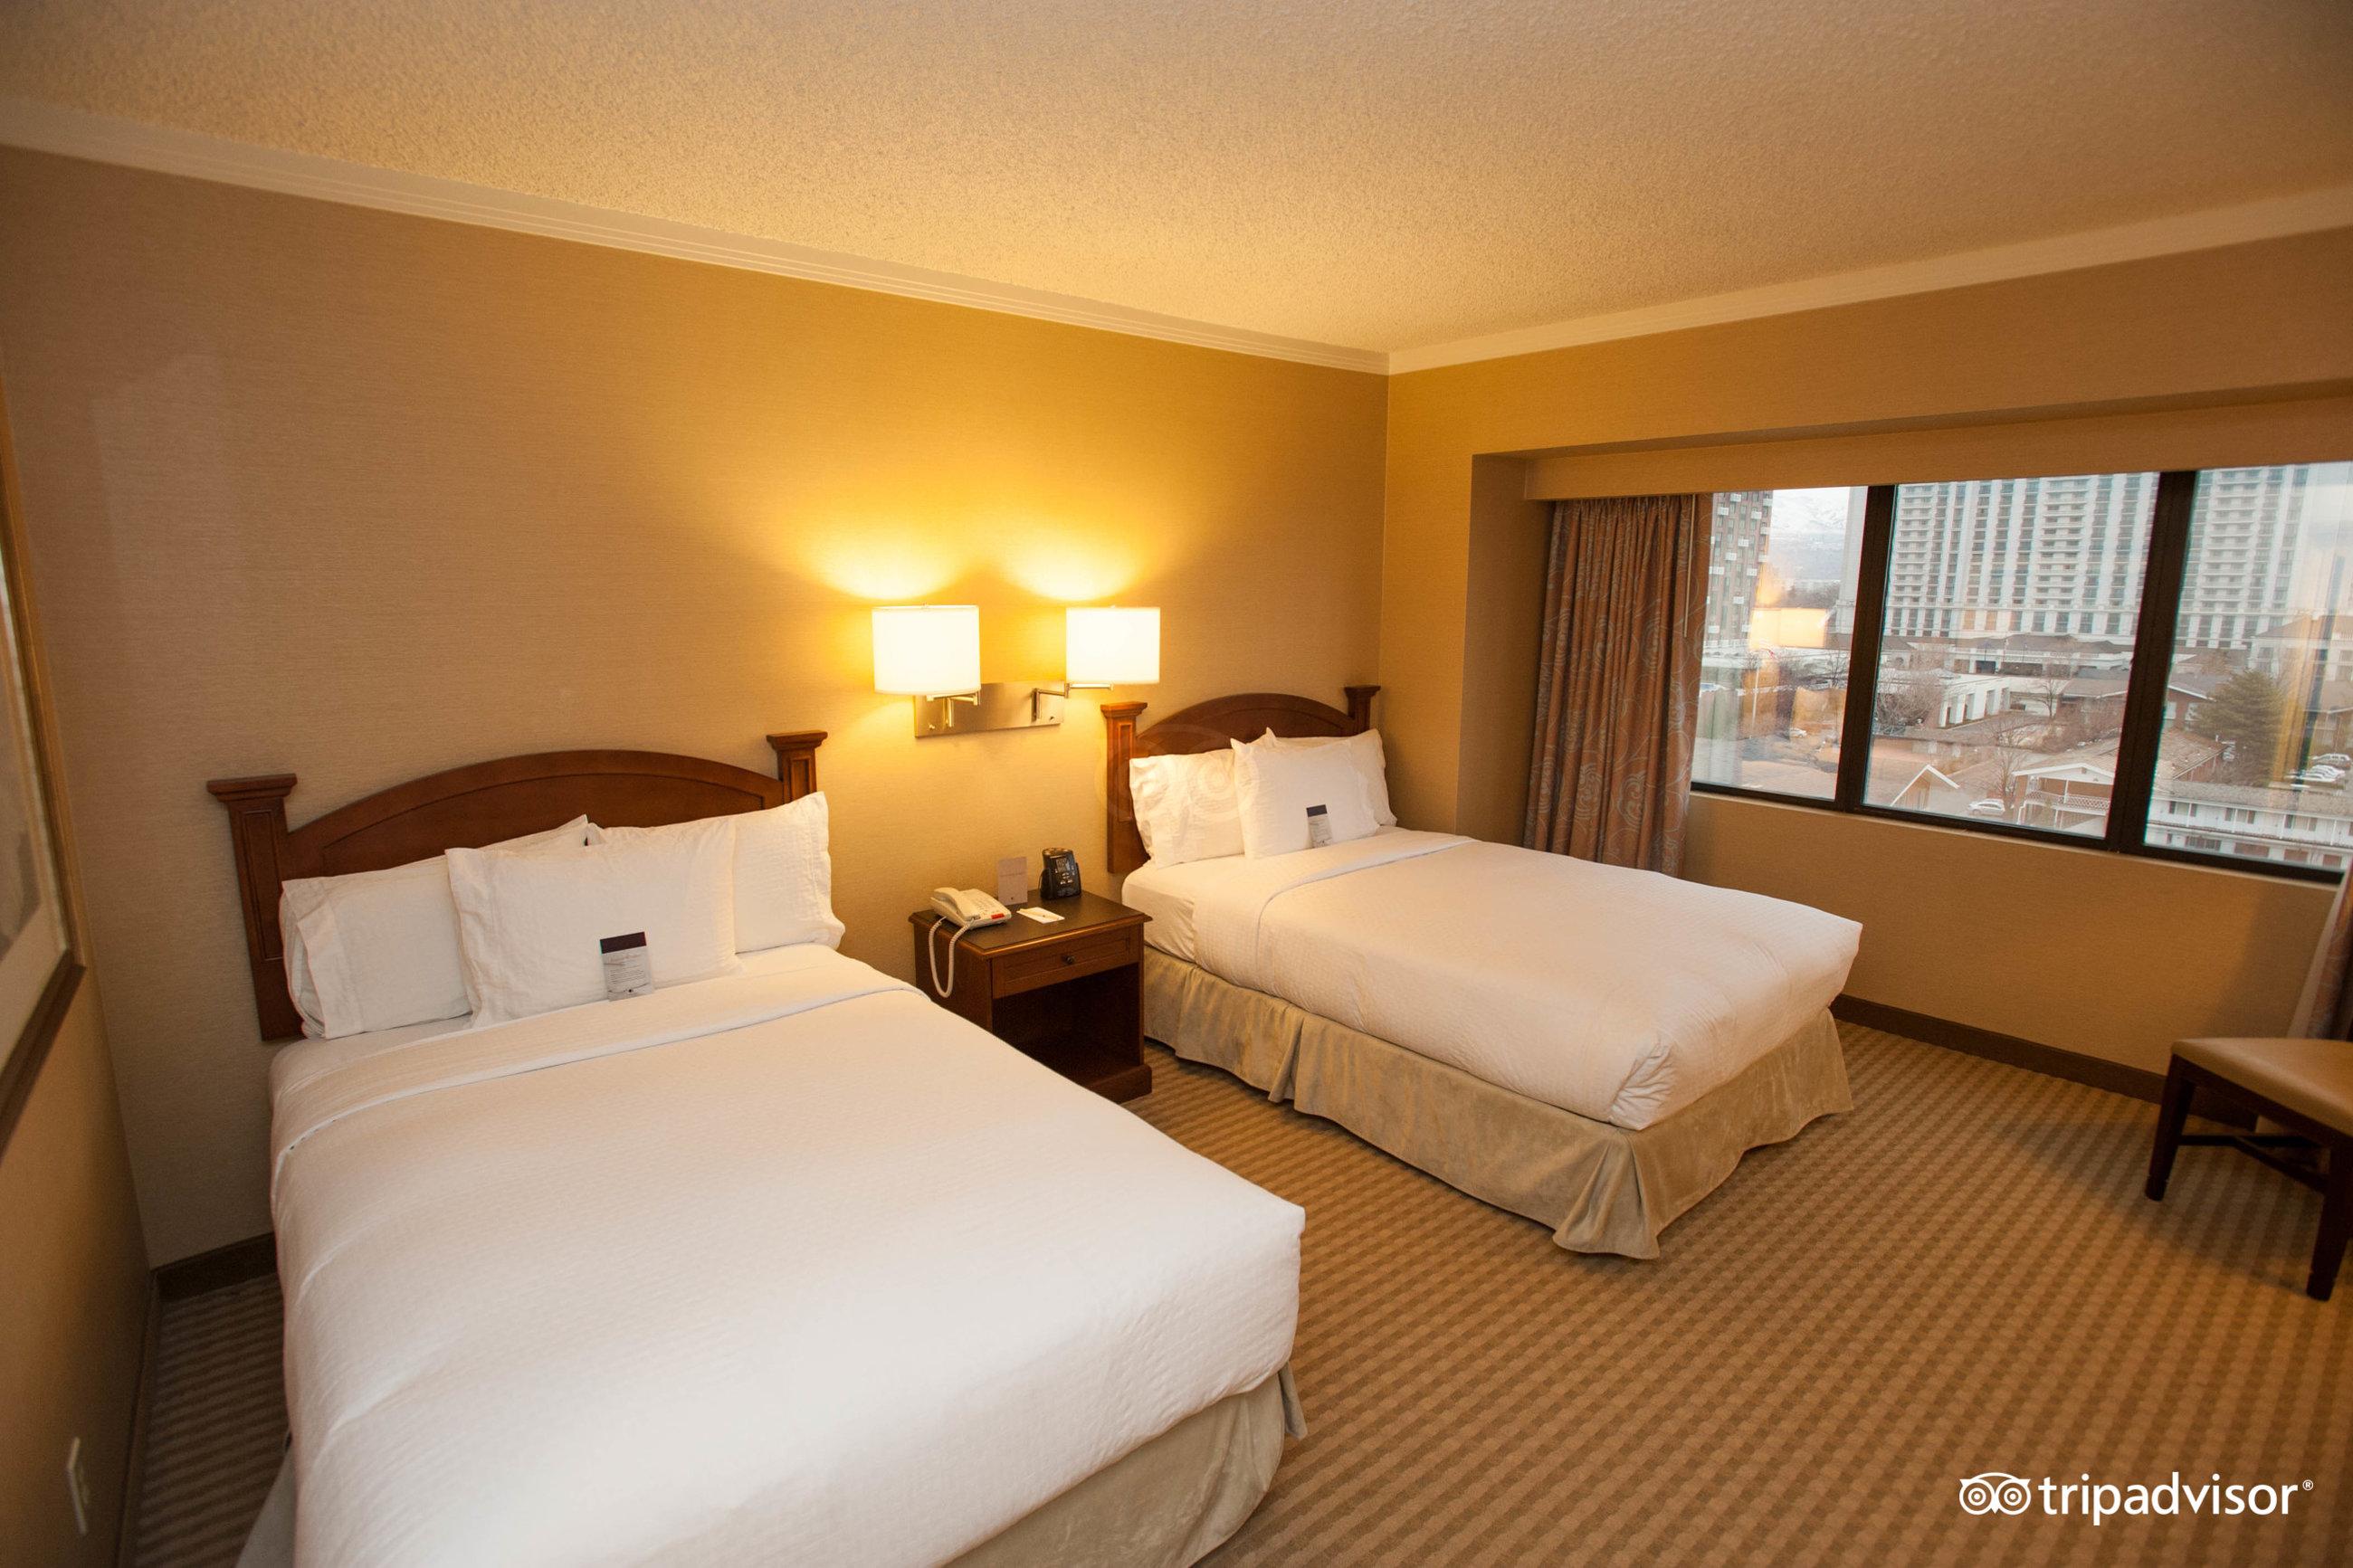 doubletree suites by hilton hotel salt lake city ut 2018 review